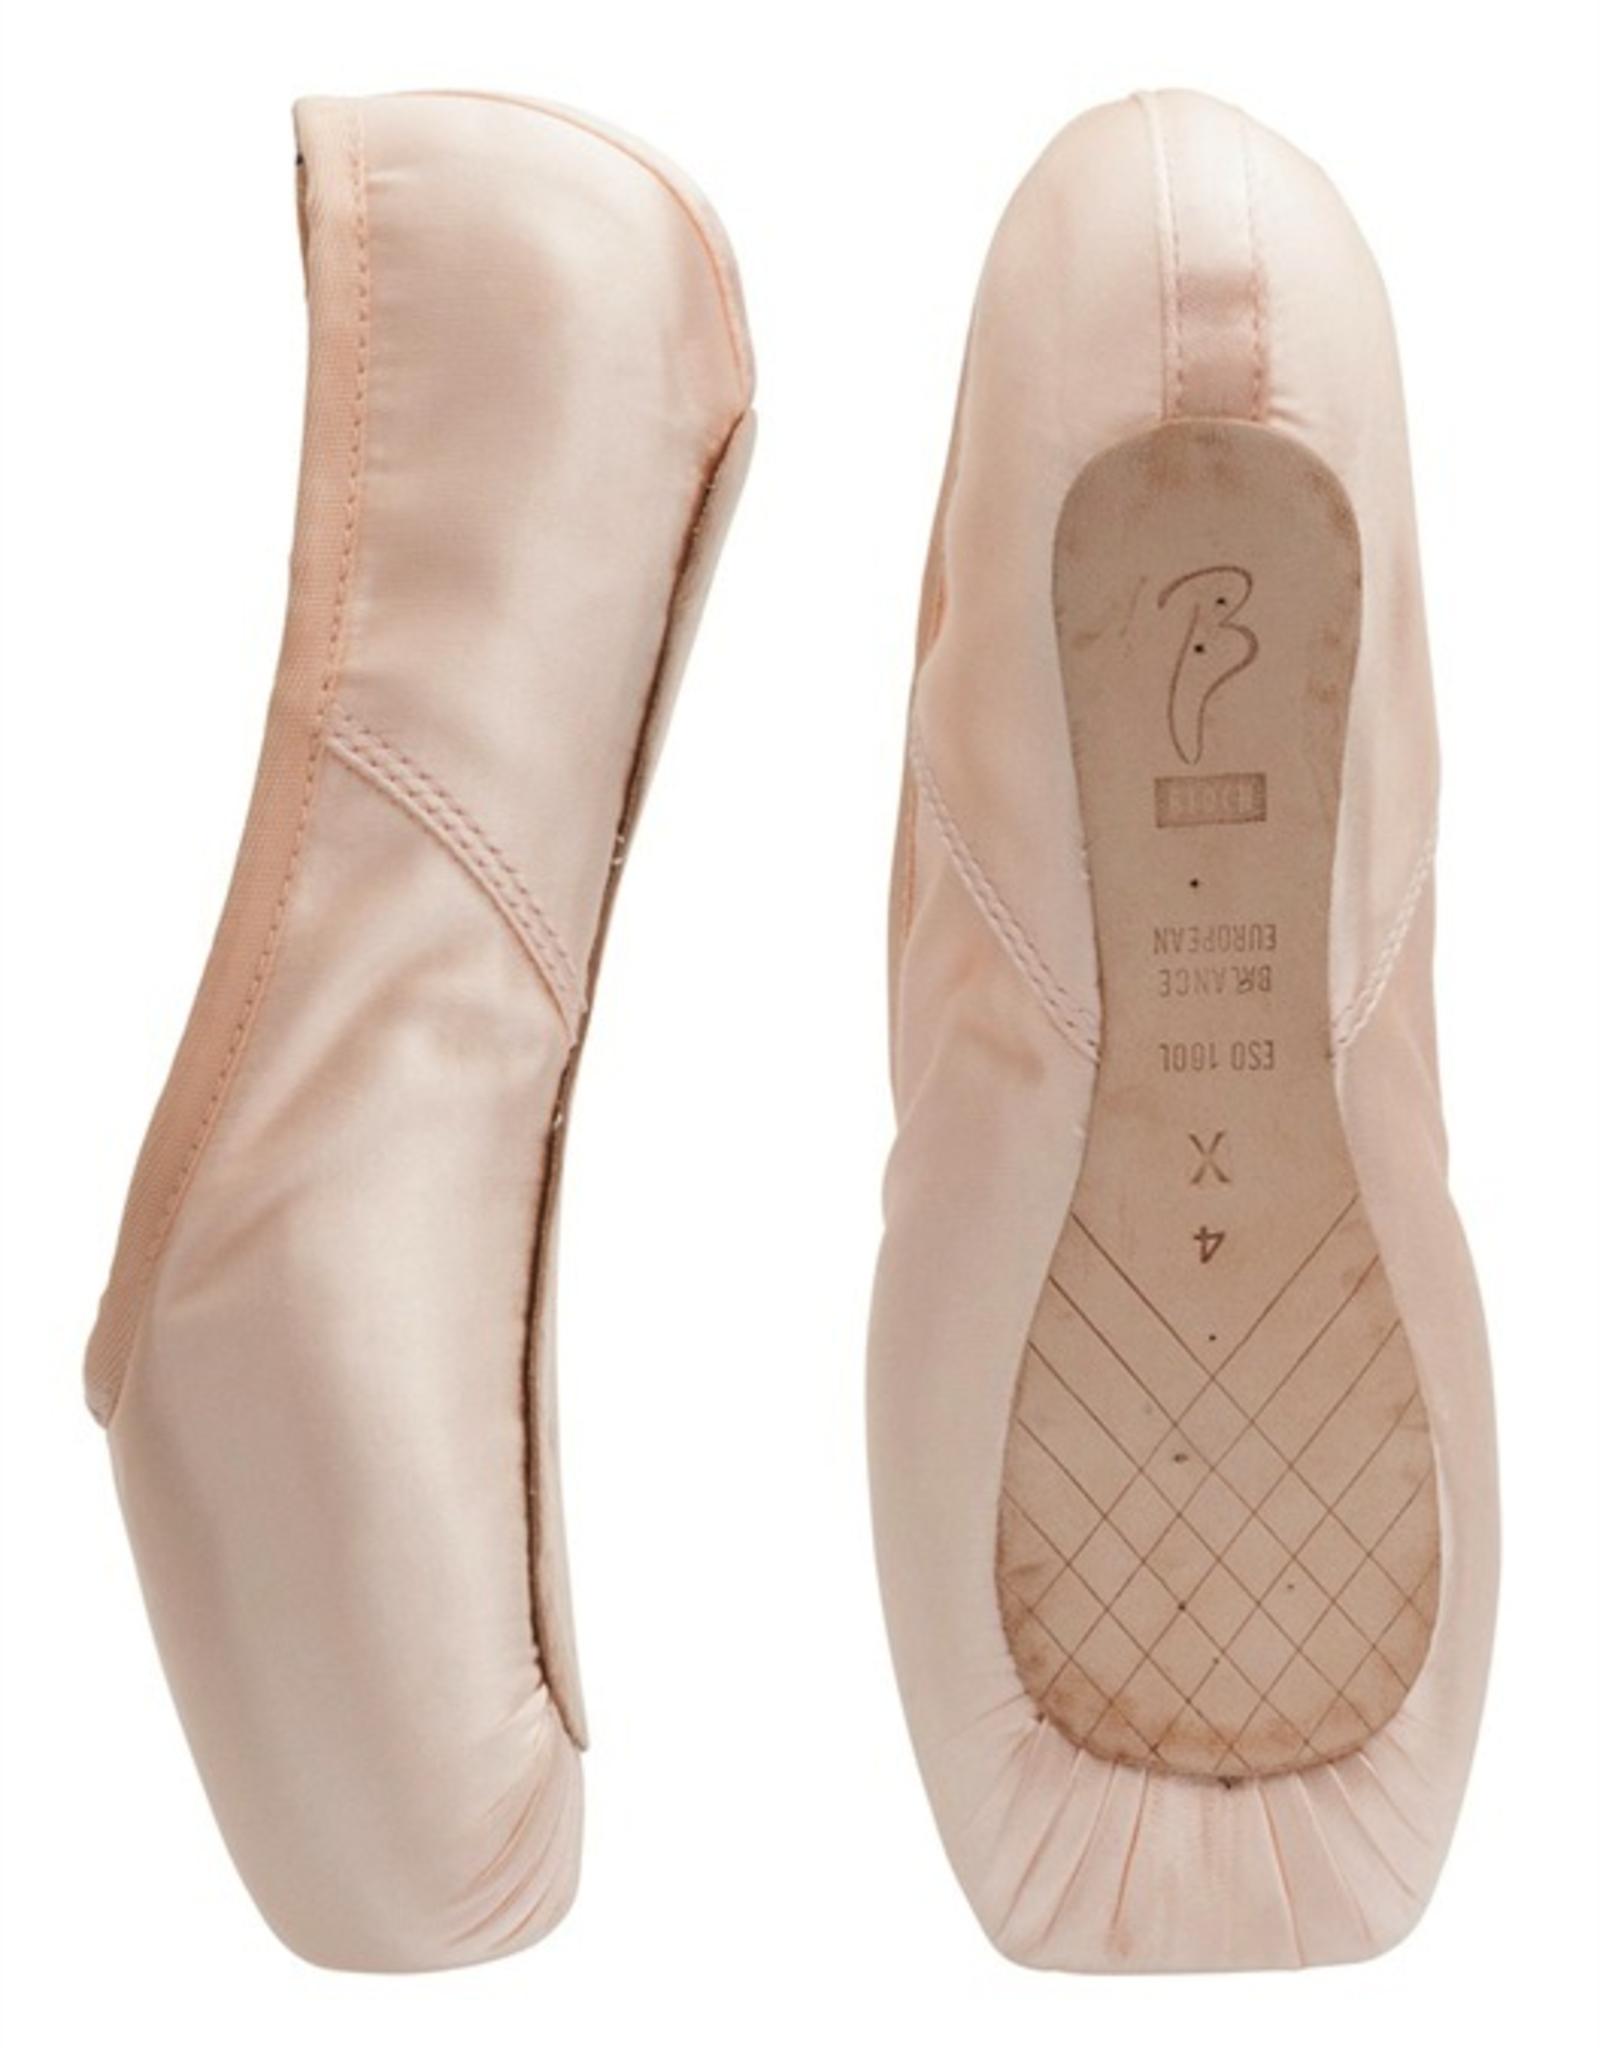 Bloch ES0160L  European Balance Pointe Shoes